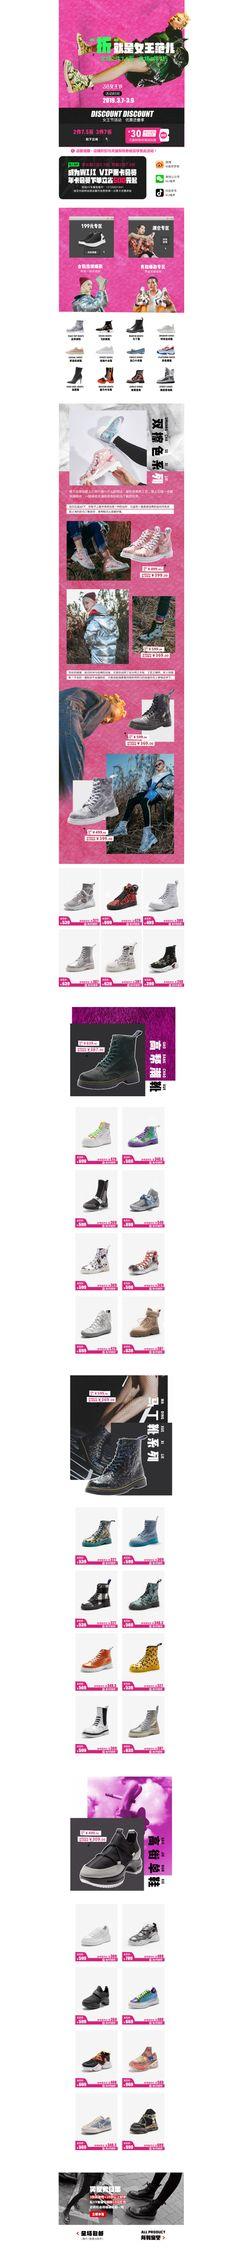 WIJI女鞋3.8女王节页面。品牌视觉 - puff1208 | ello